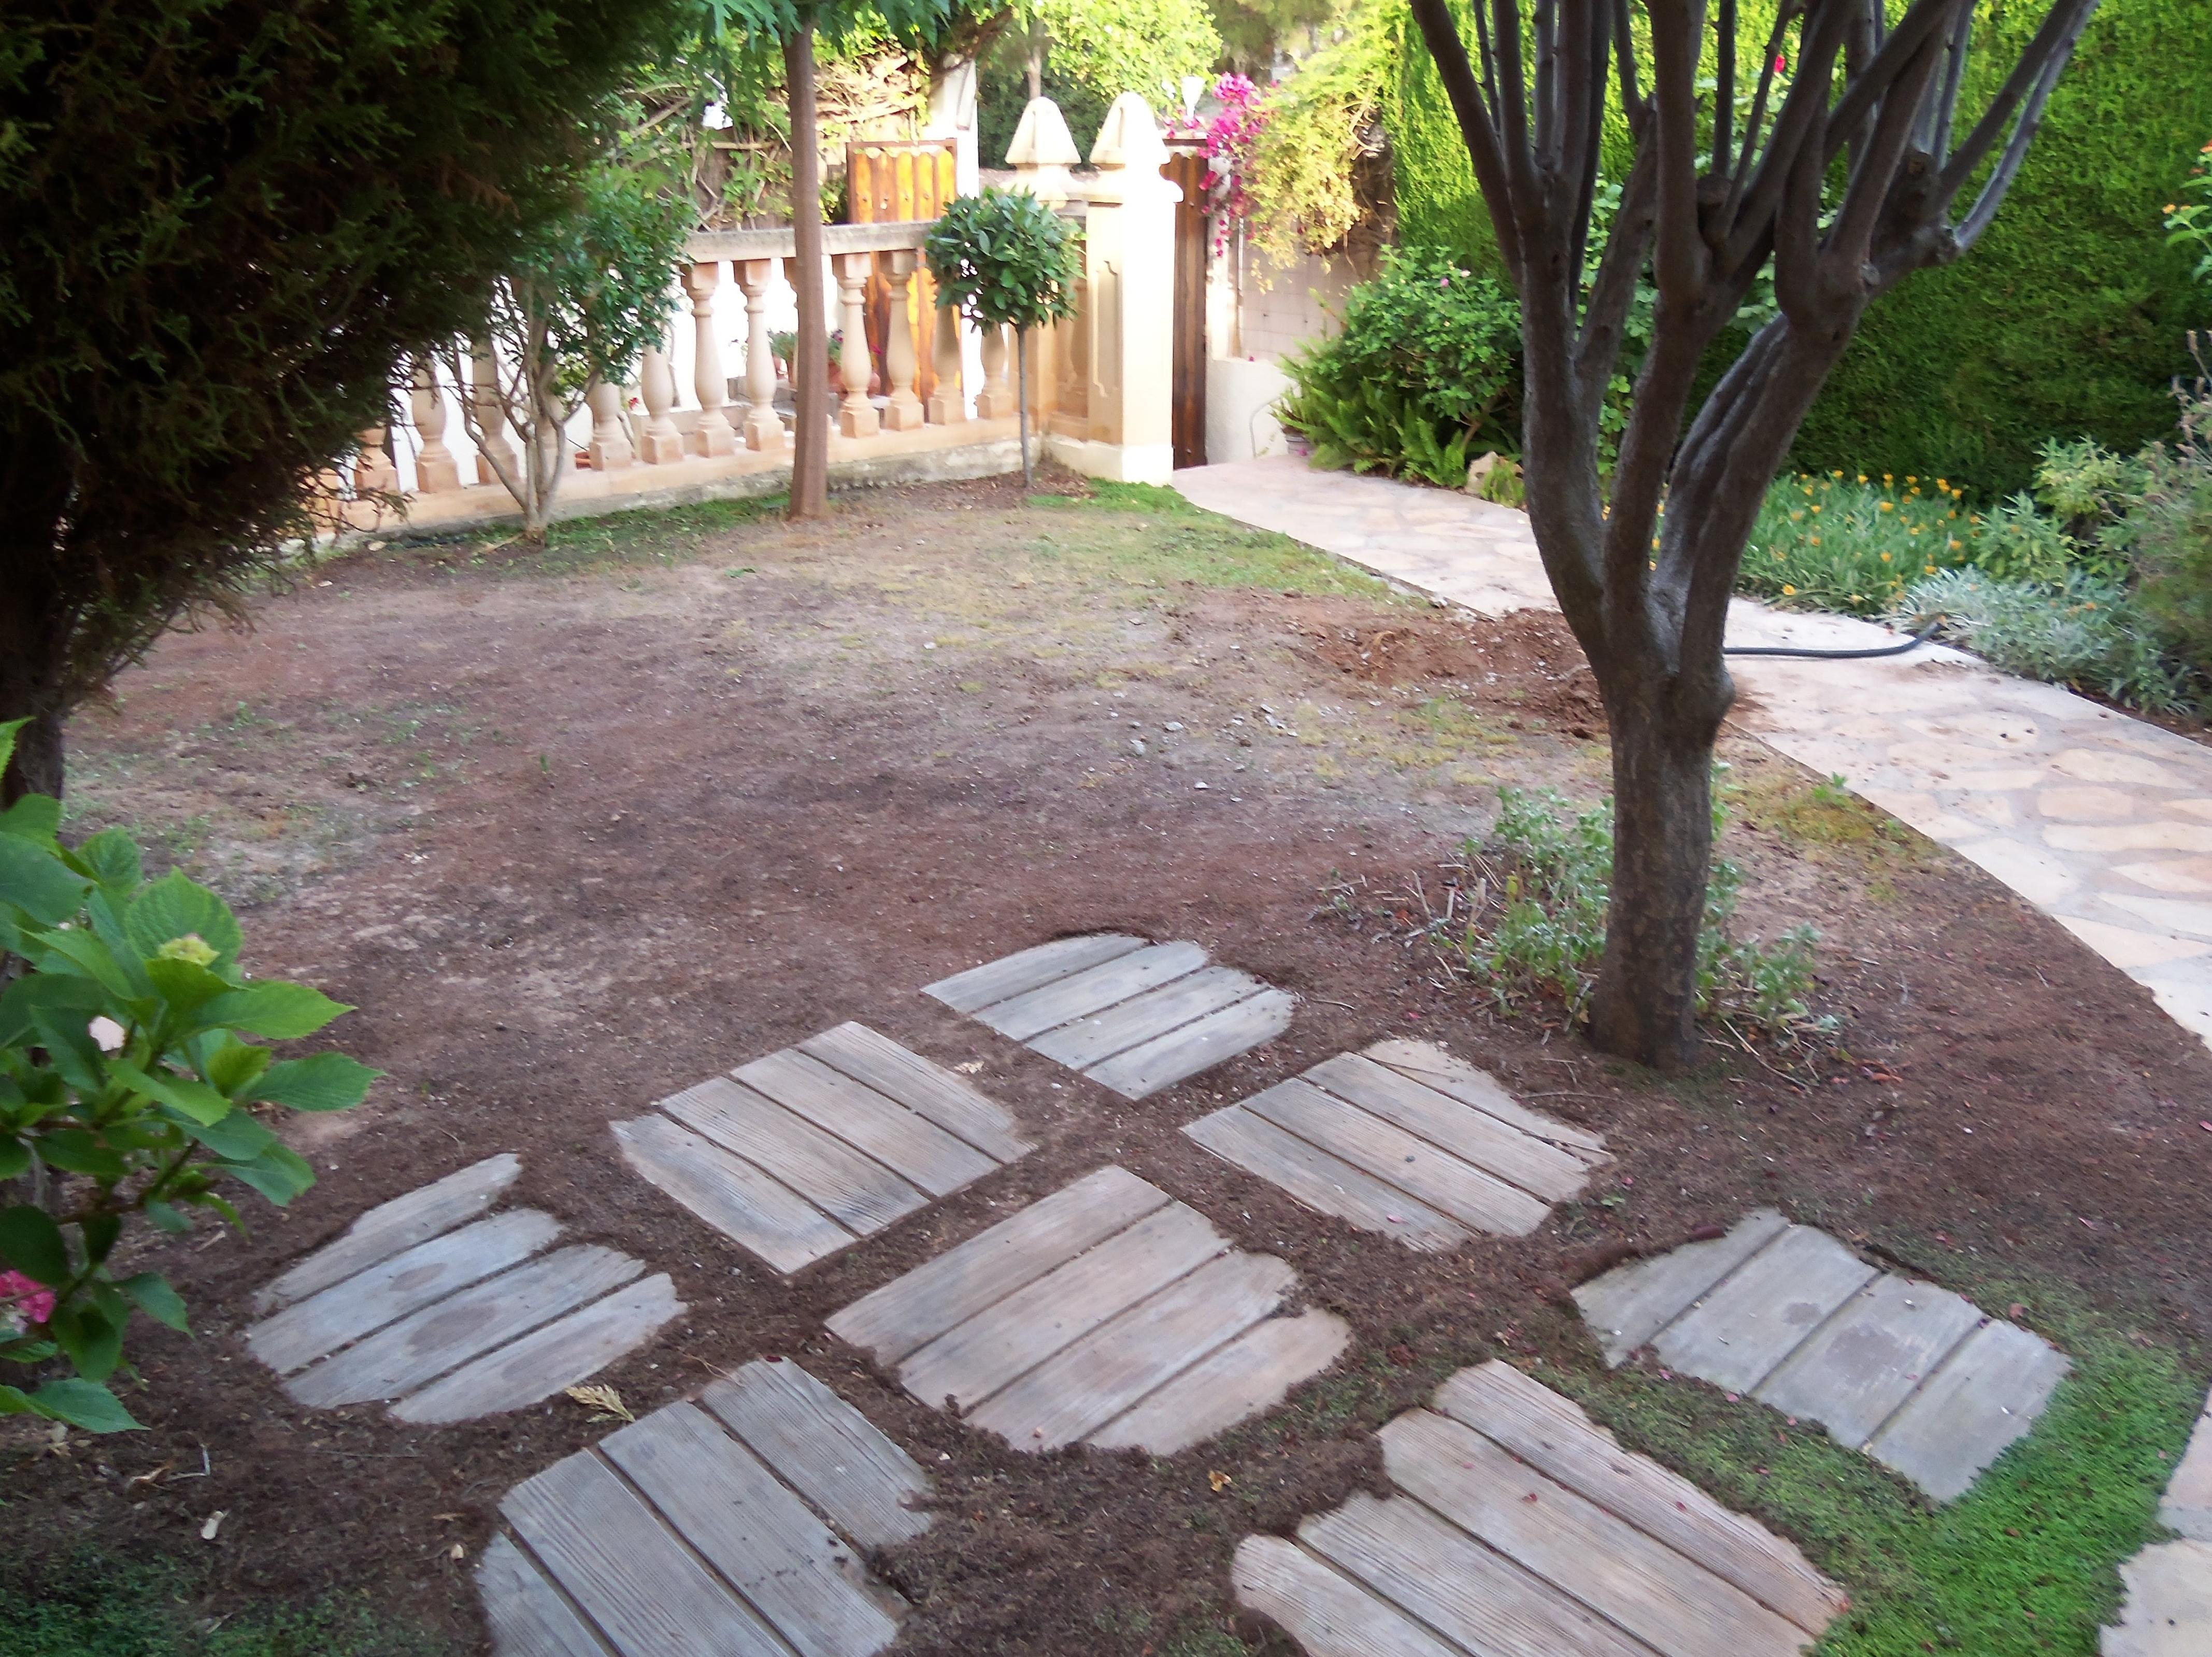 Proyecto Ches Pa con césped artificial en jardín particular en Valencia - Antes........